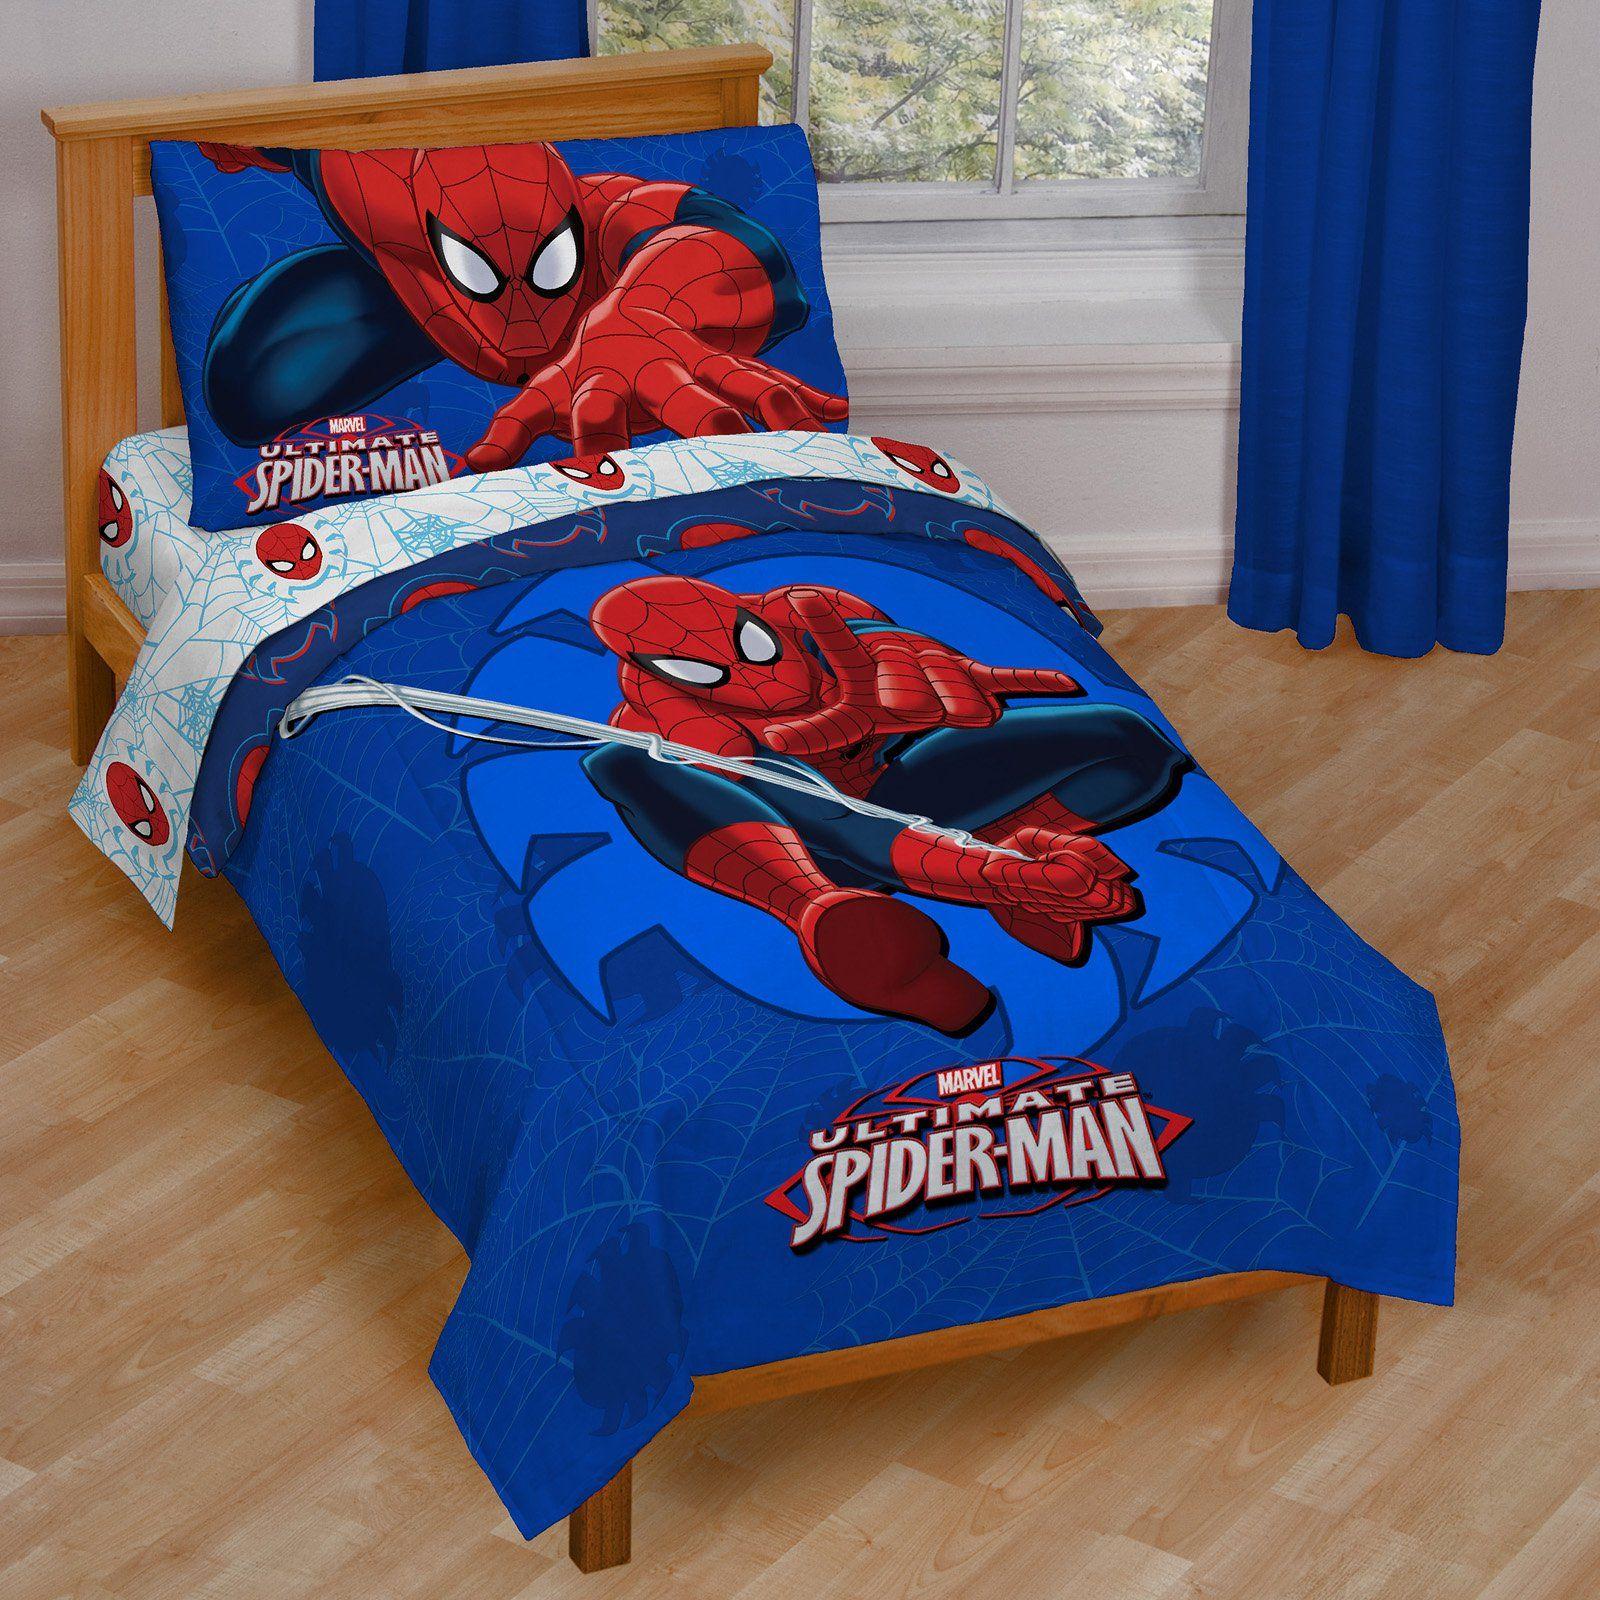 bookworm design bedroom argos full duvet single cover spiderman size set